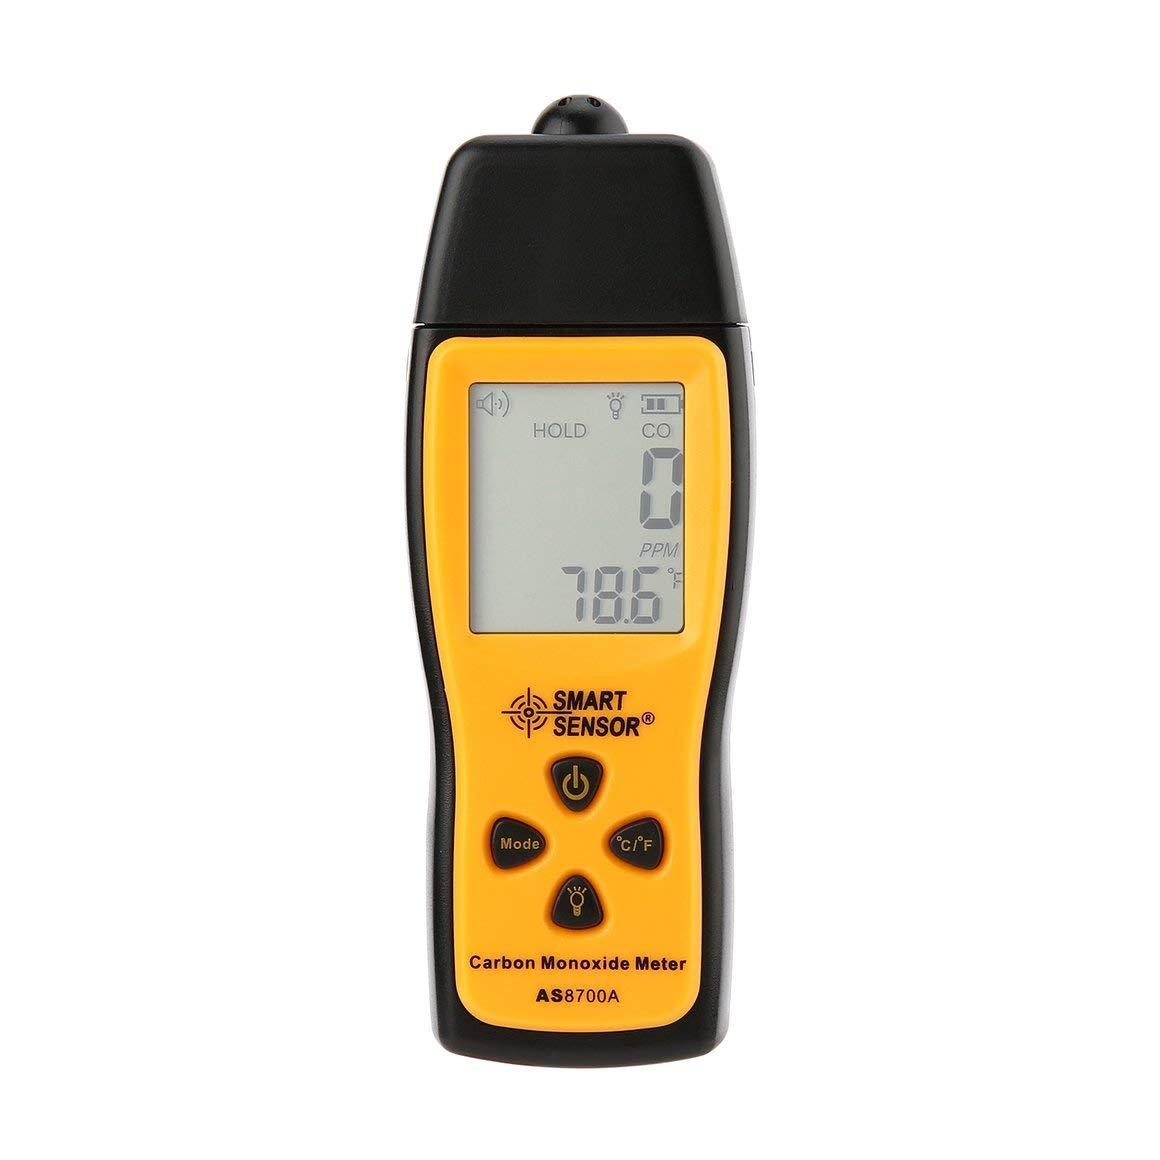 Funnyrunstore Medidor de monóxido de Carbono de Mano CO portátil Detector de Fugas de Gas Analizador de Gas Detector de Alta precisión Monitor de Gas ...